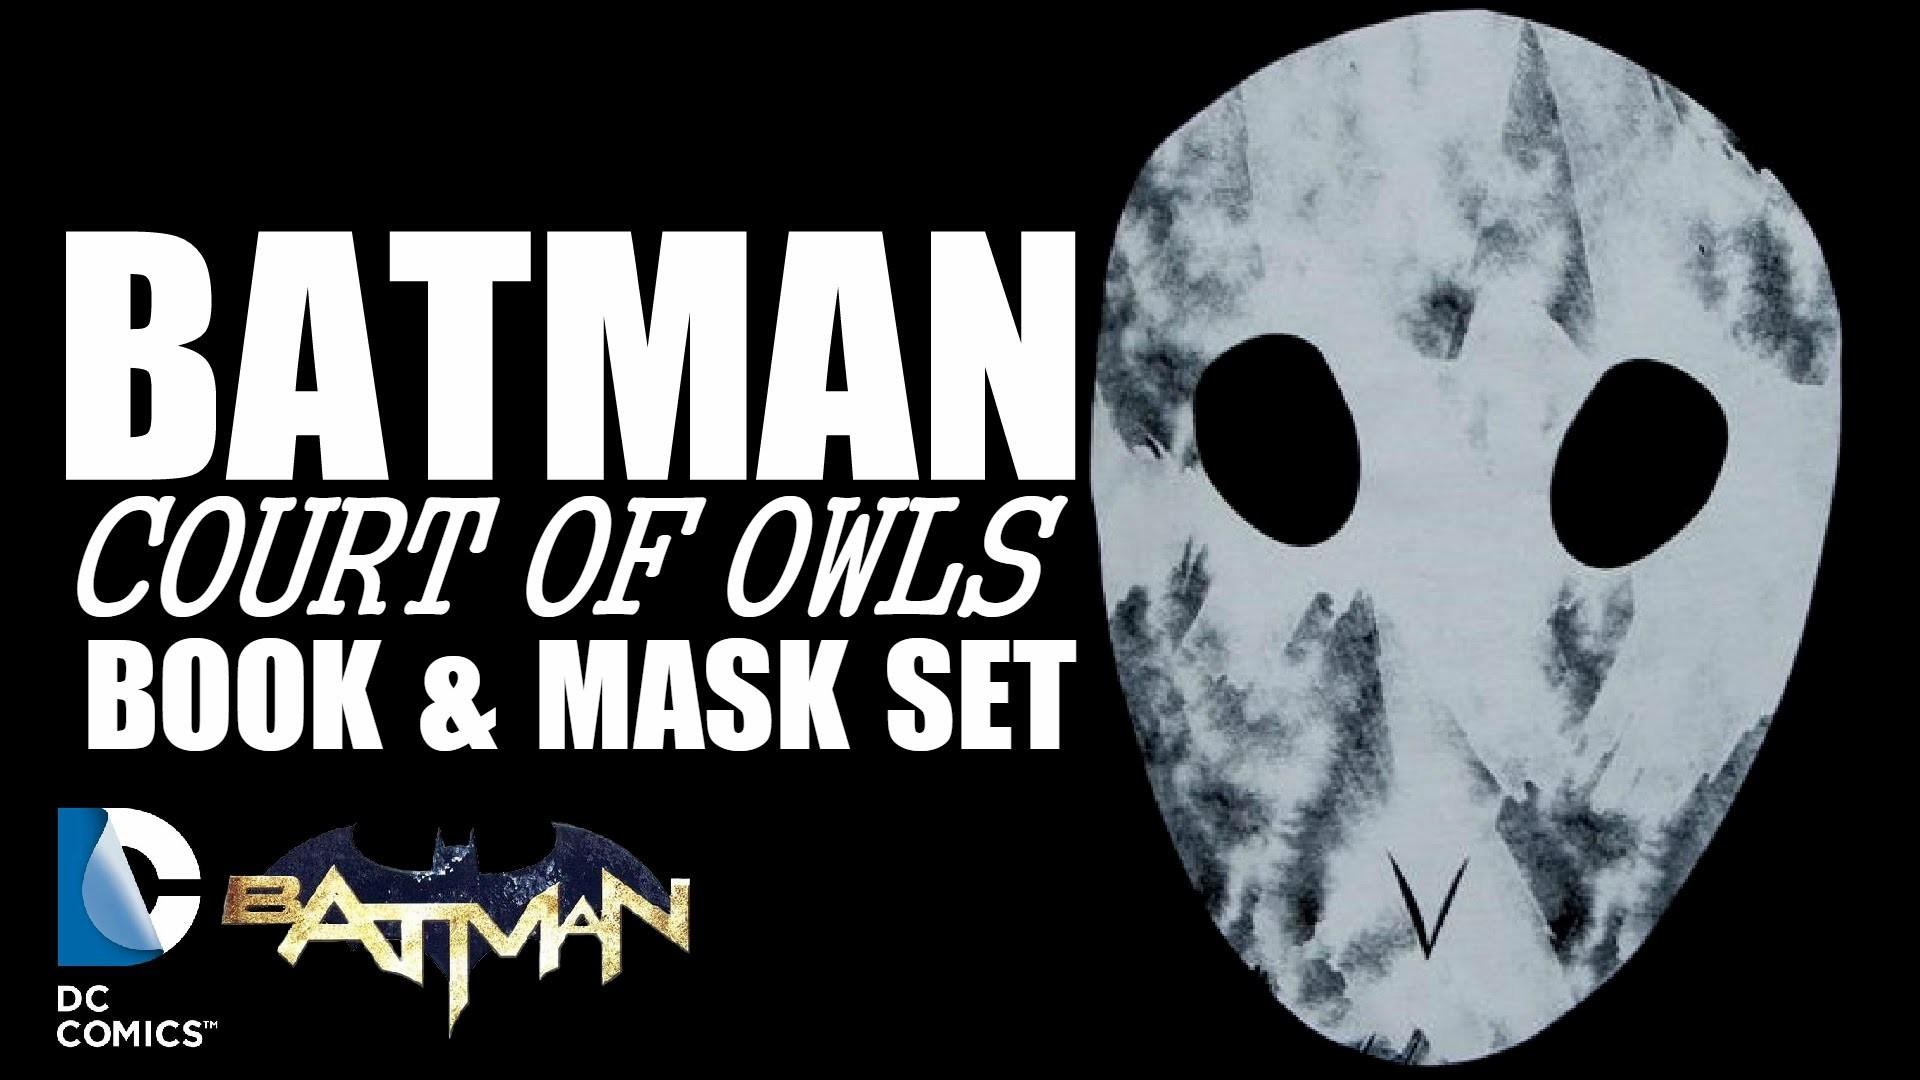 Batman: Court of Owls Book & Mask Set Review